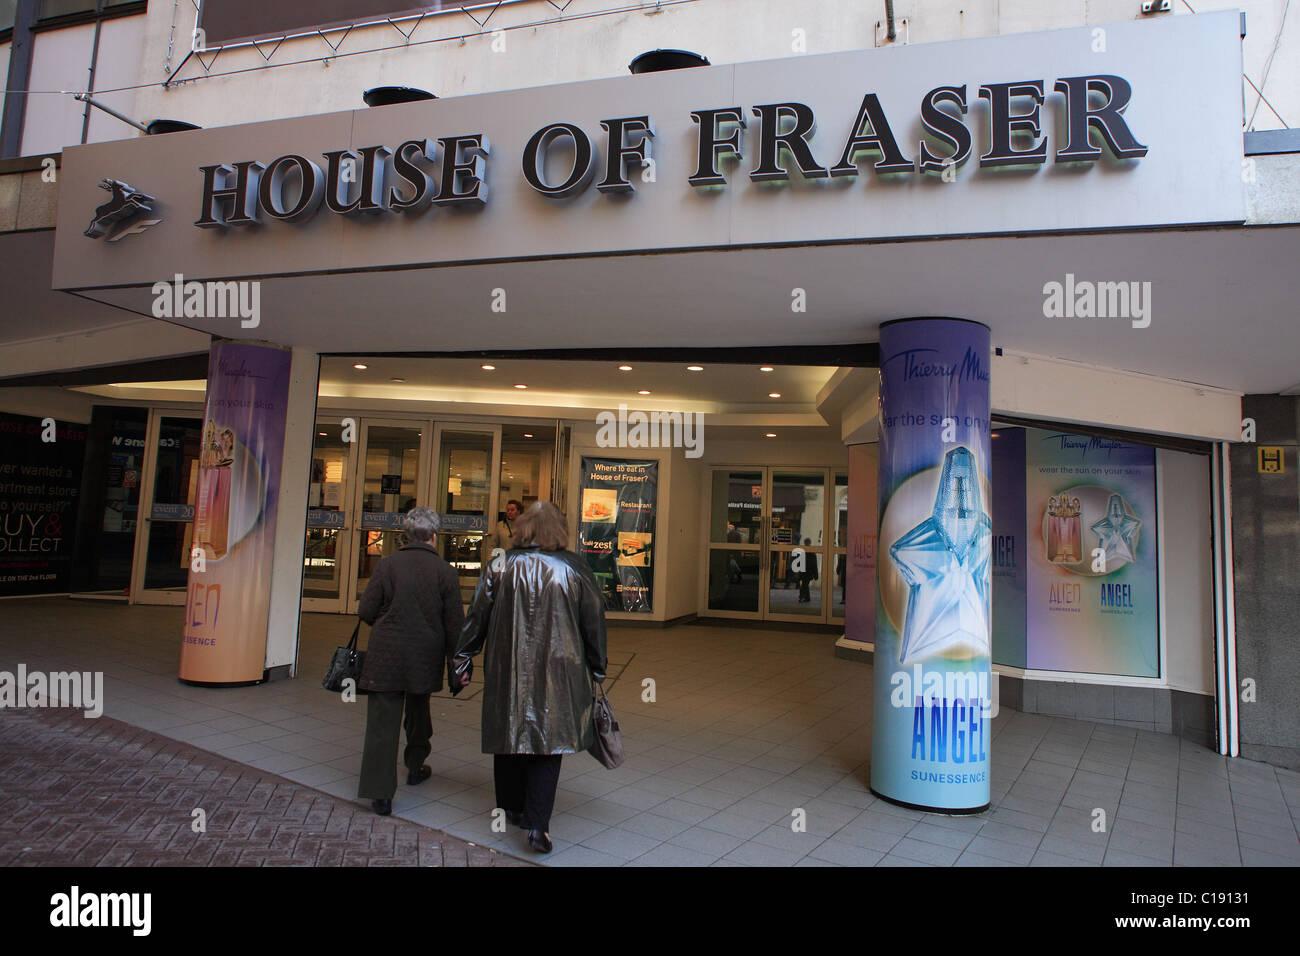 House of Fraser Department Store, Birmingham, England, UK - Stock Image